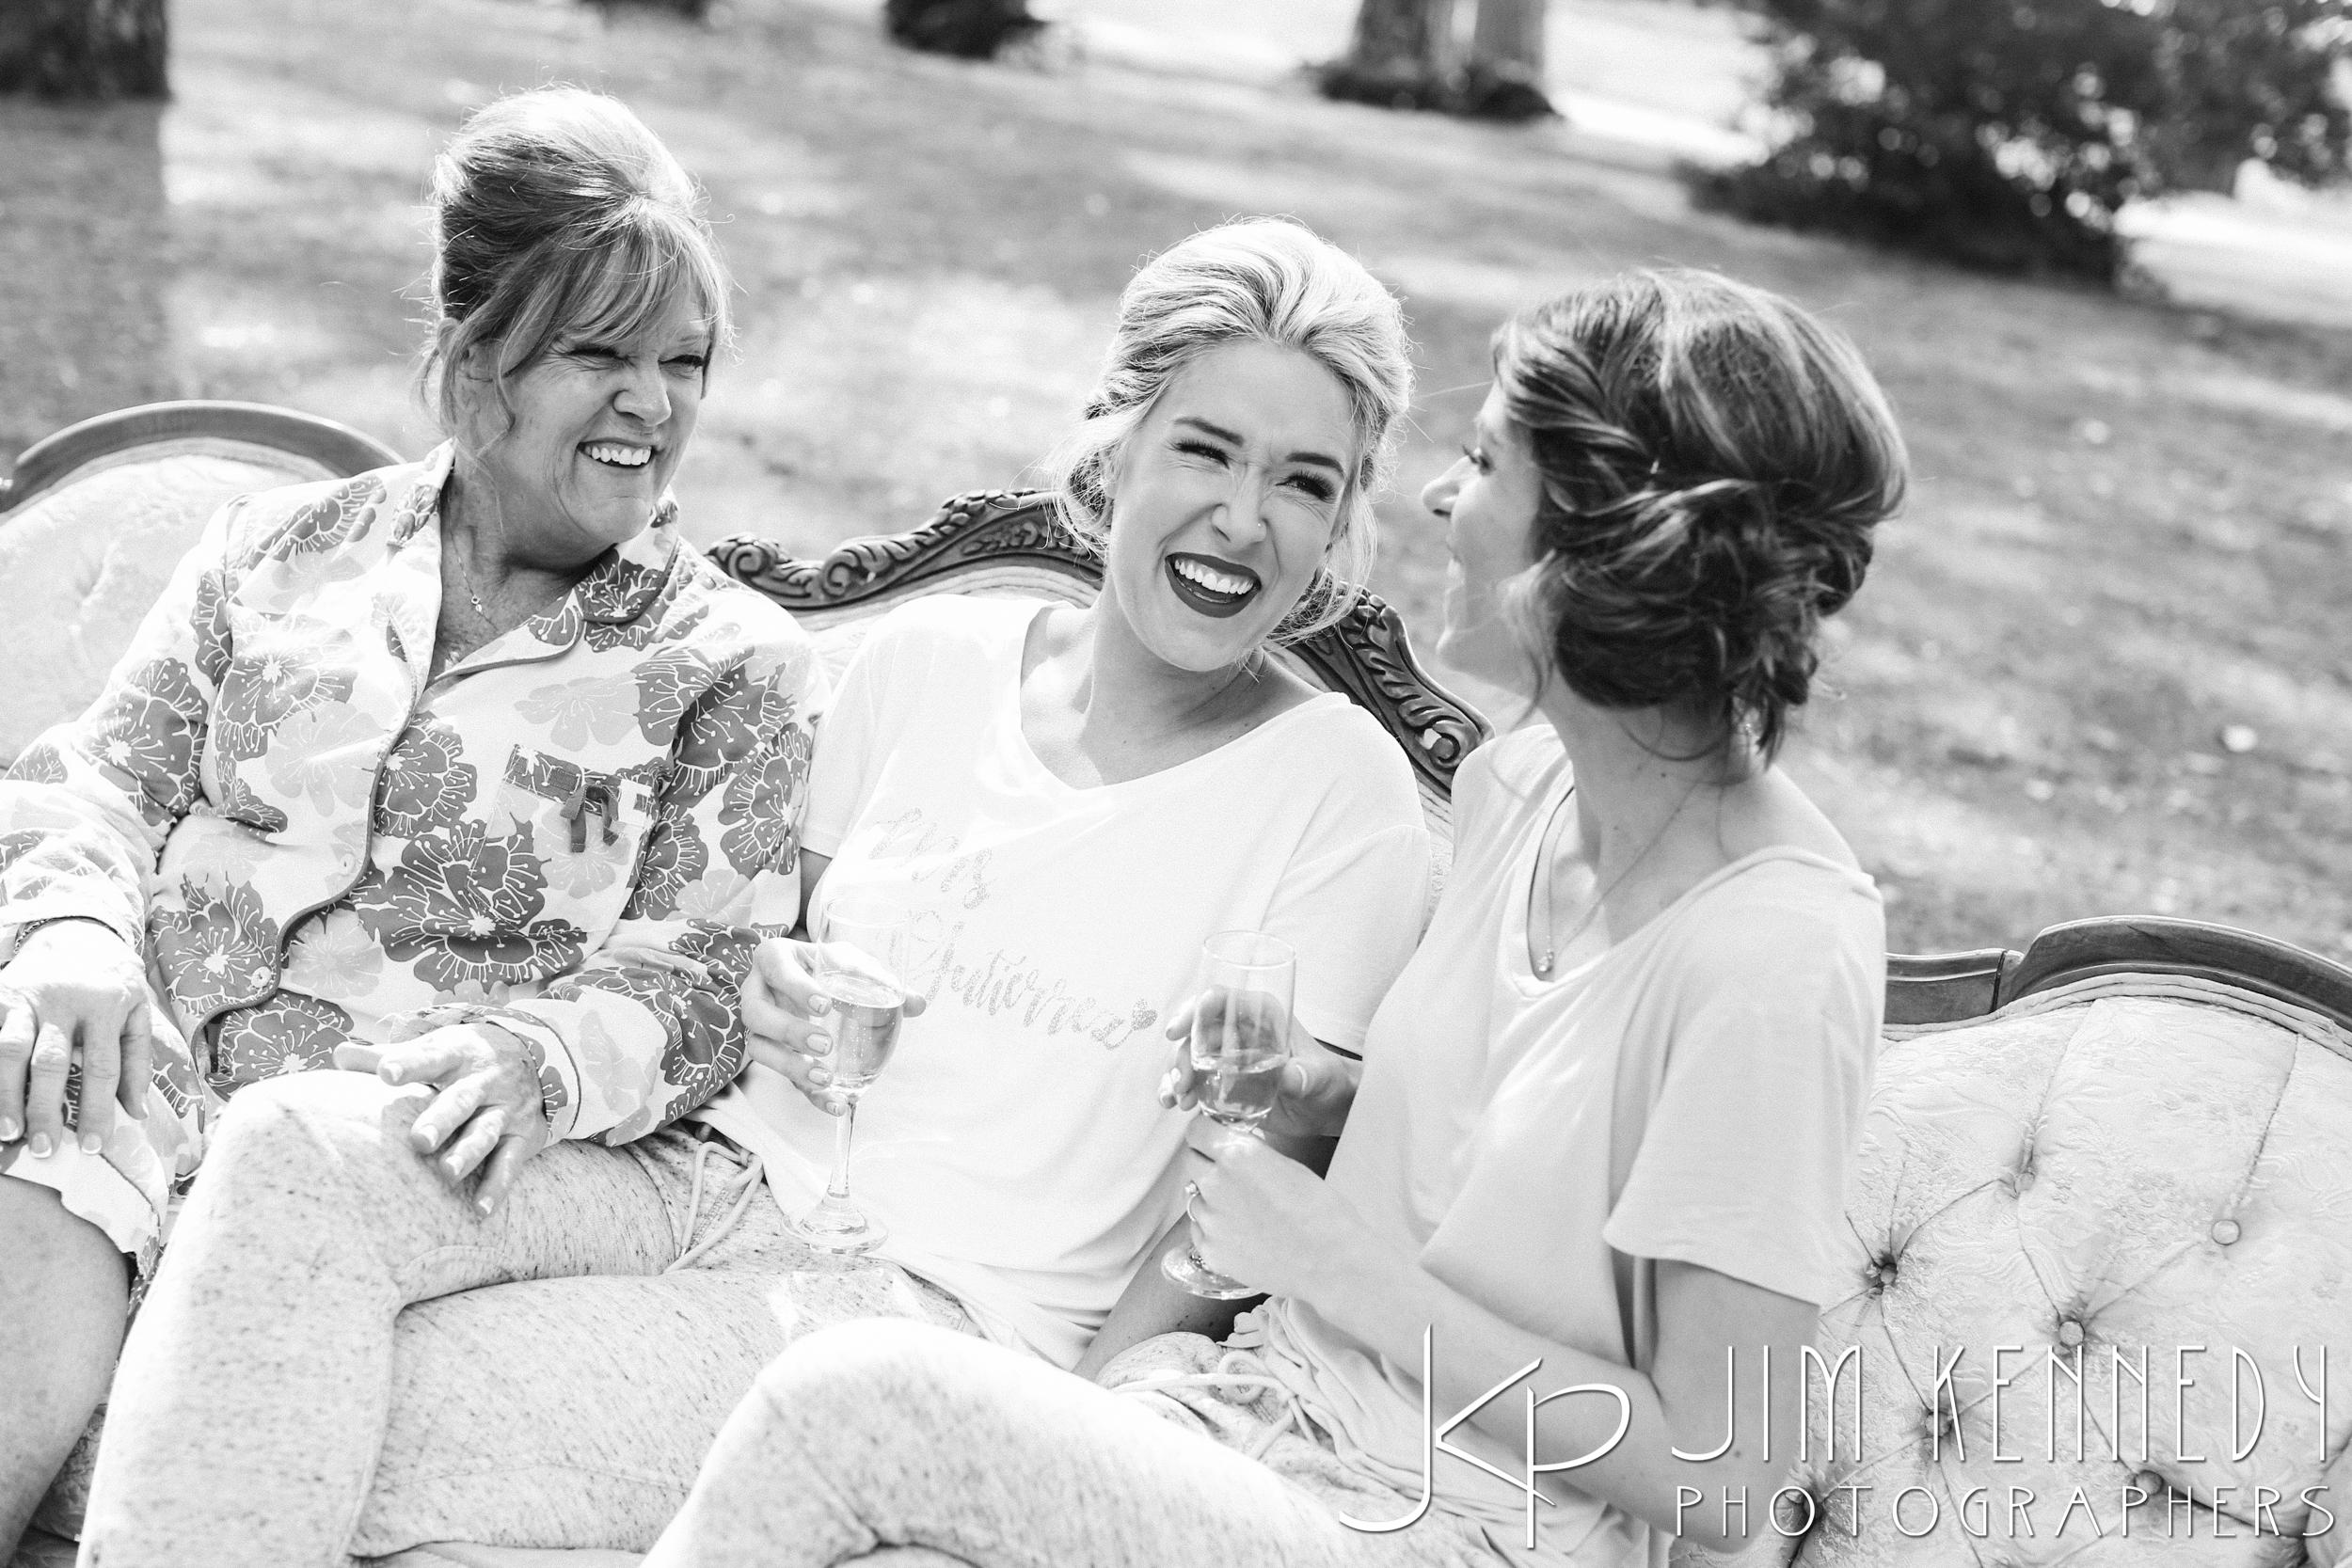 jim_kennedy_photographers_highland_springs_wedding_caitlyn_0035.jpg